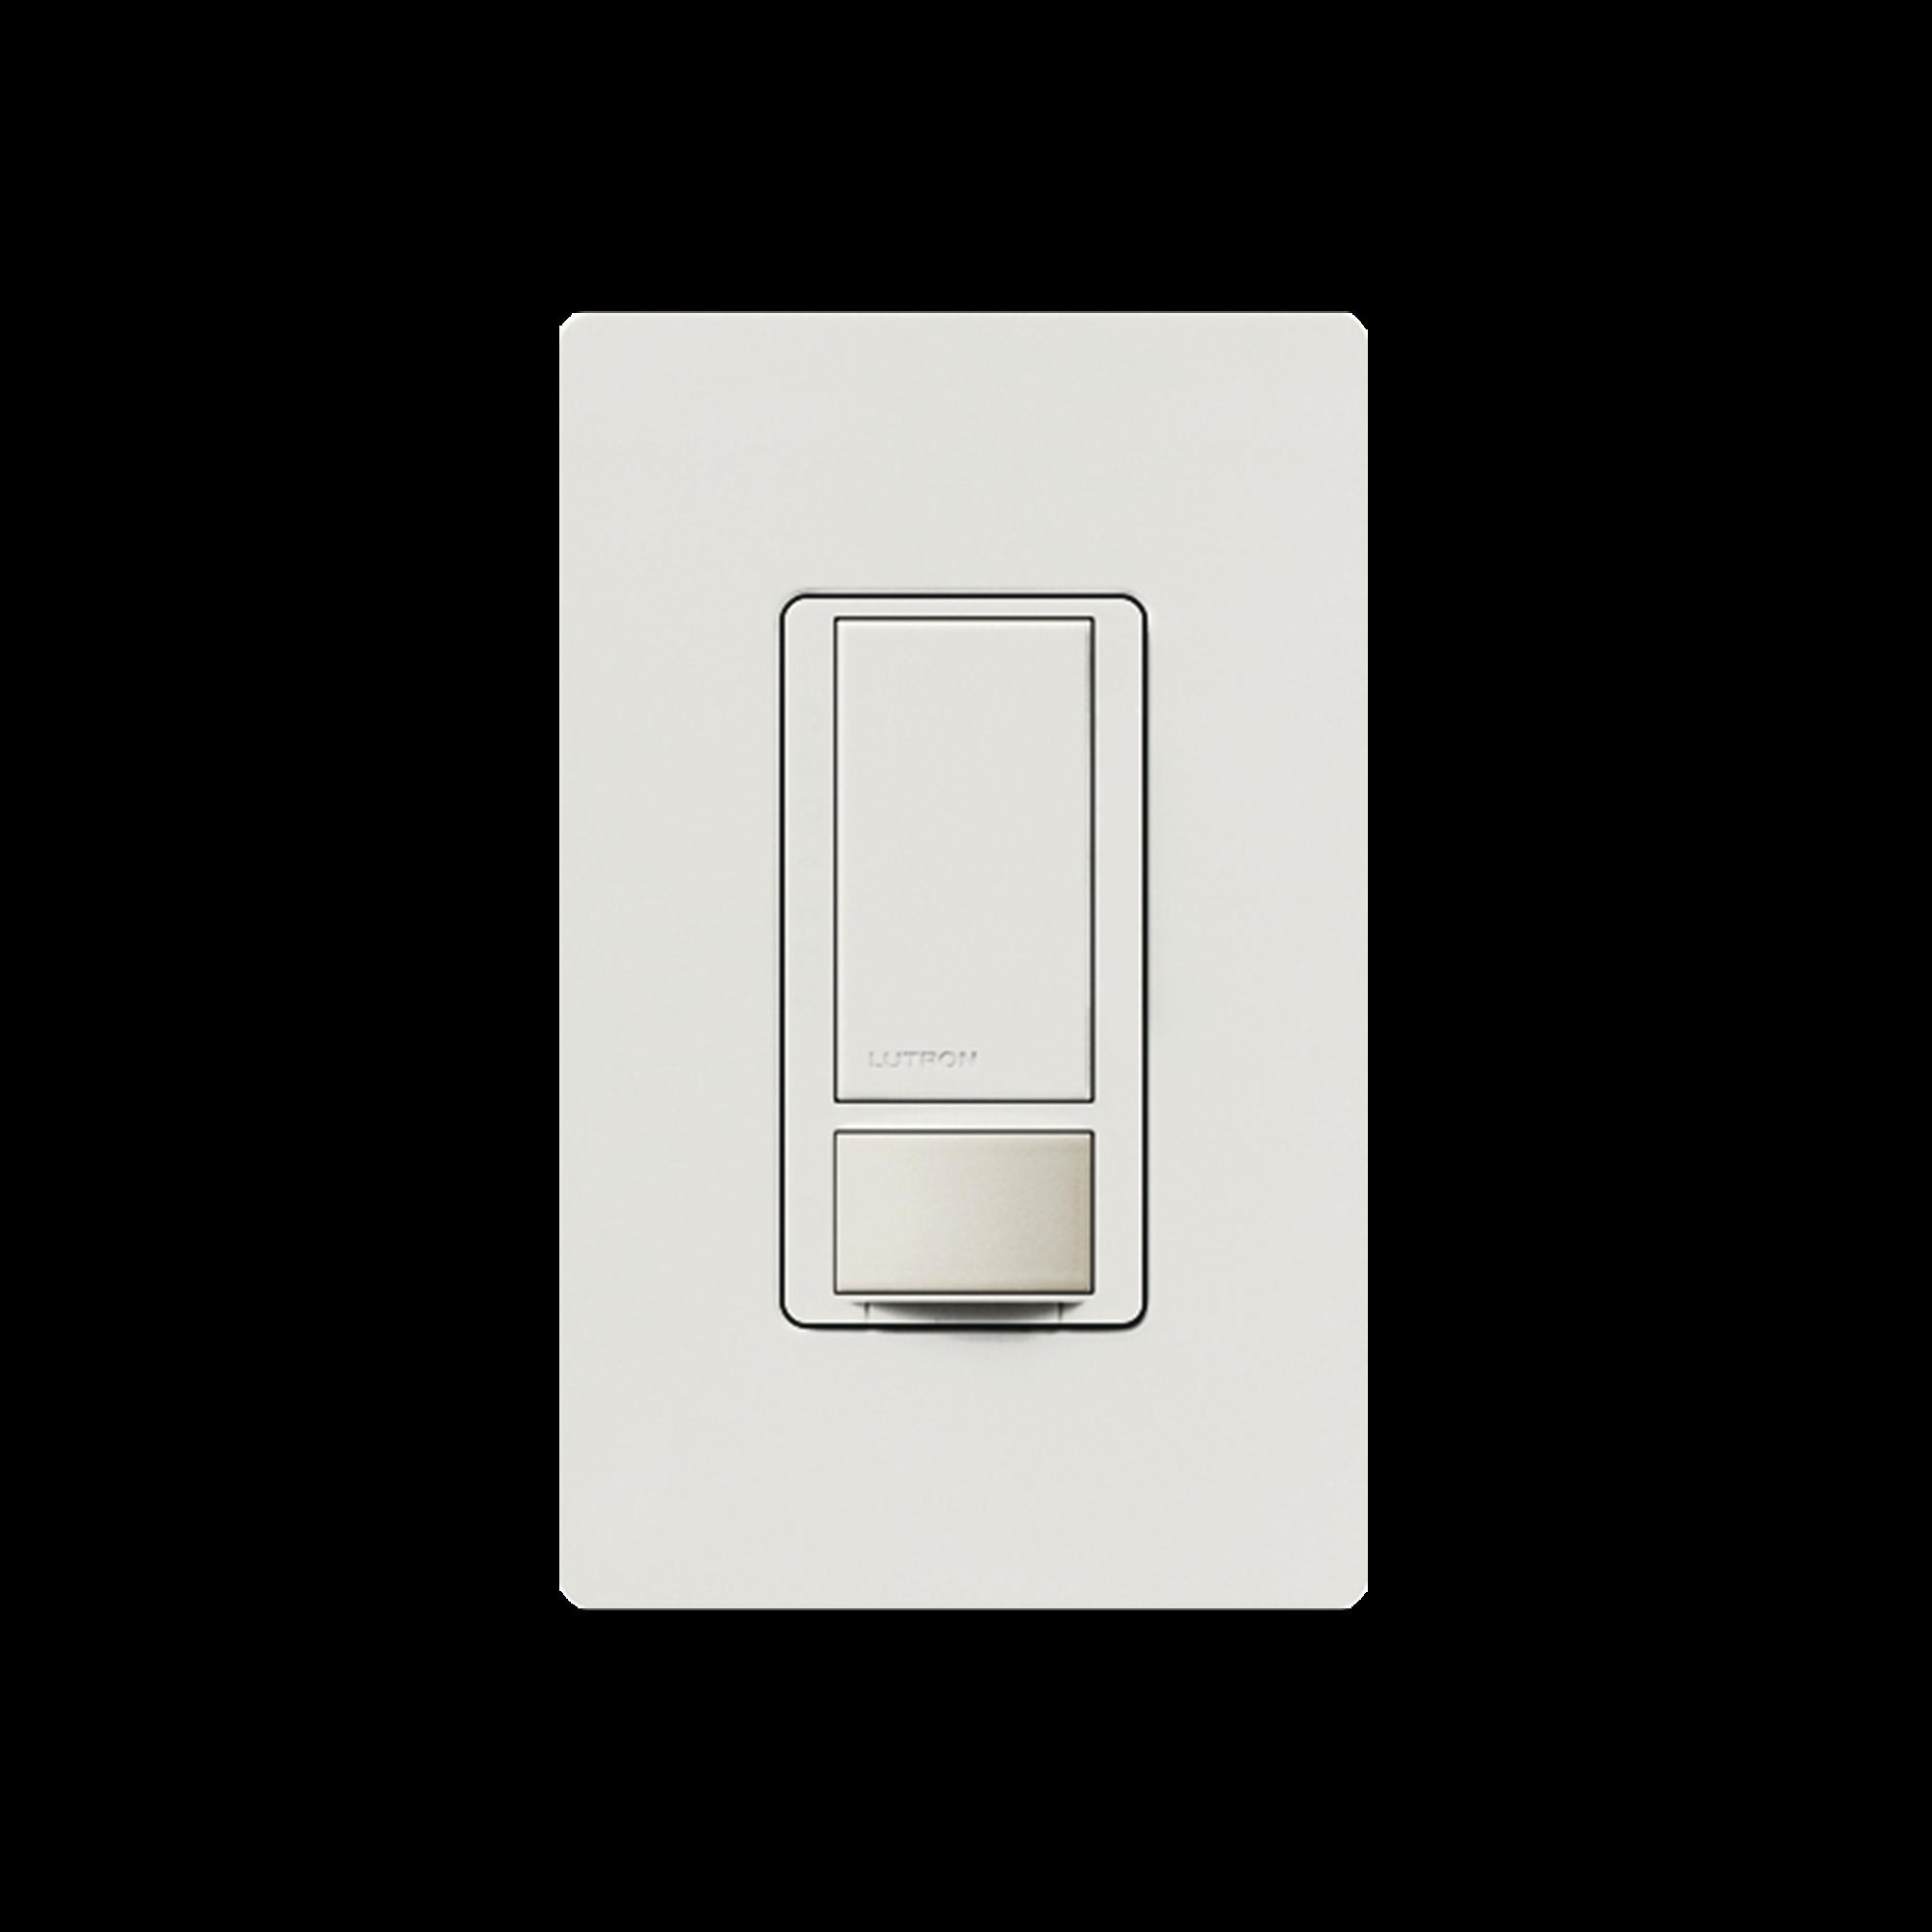 Switch on/off / Linea Maestro Switch con sensor de ocupación, multilocacion / un solo polo 120V/2A, color blanco.